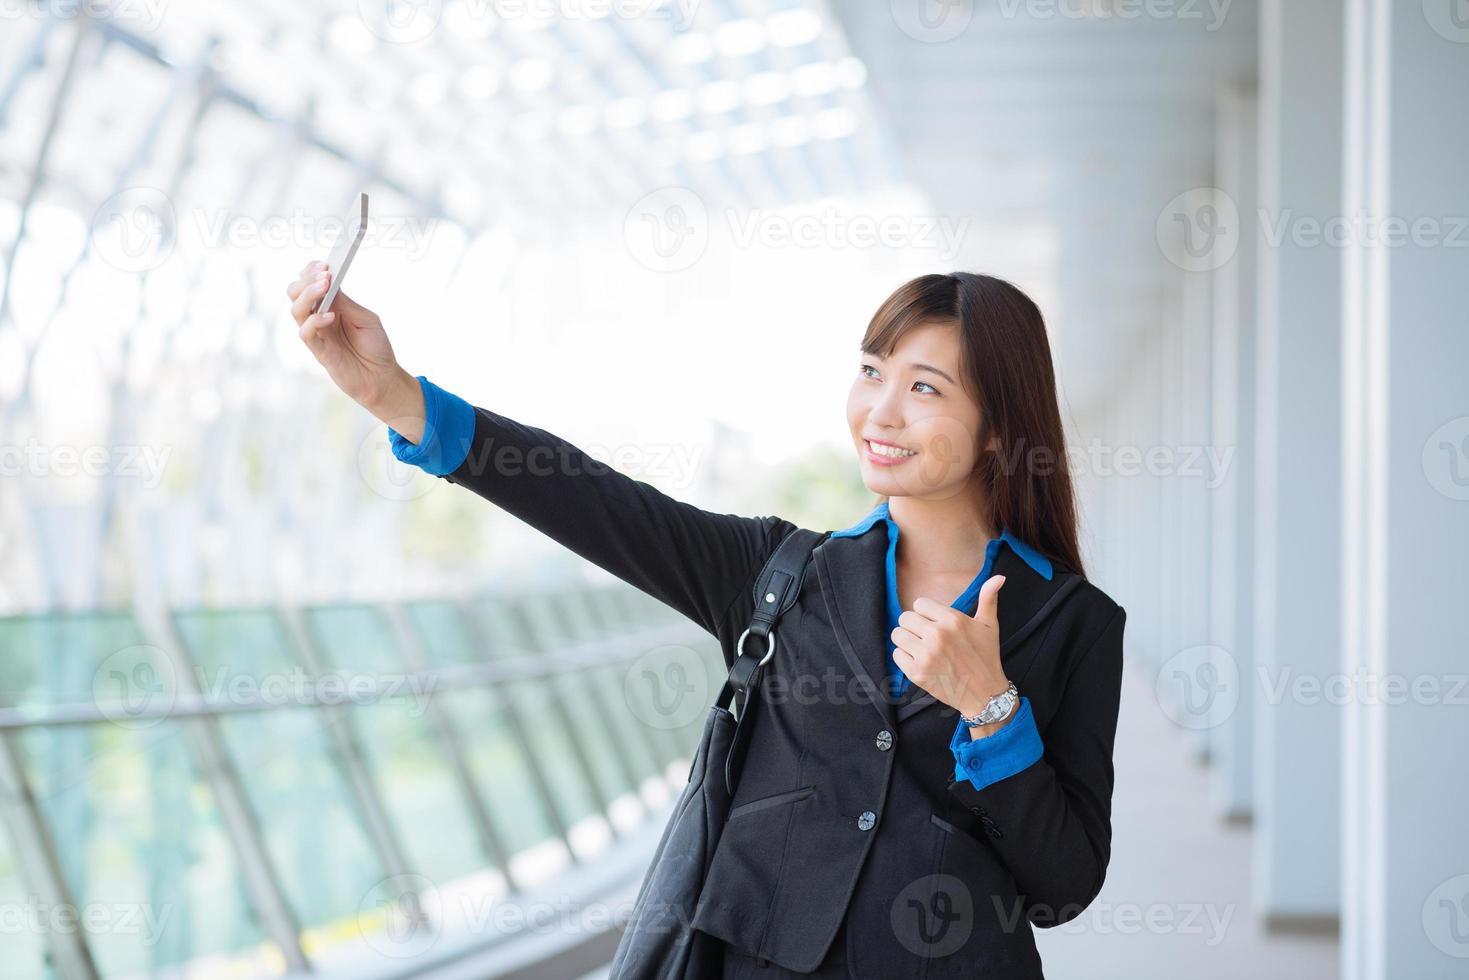 tar selfie foto